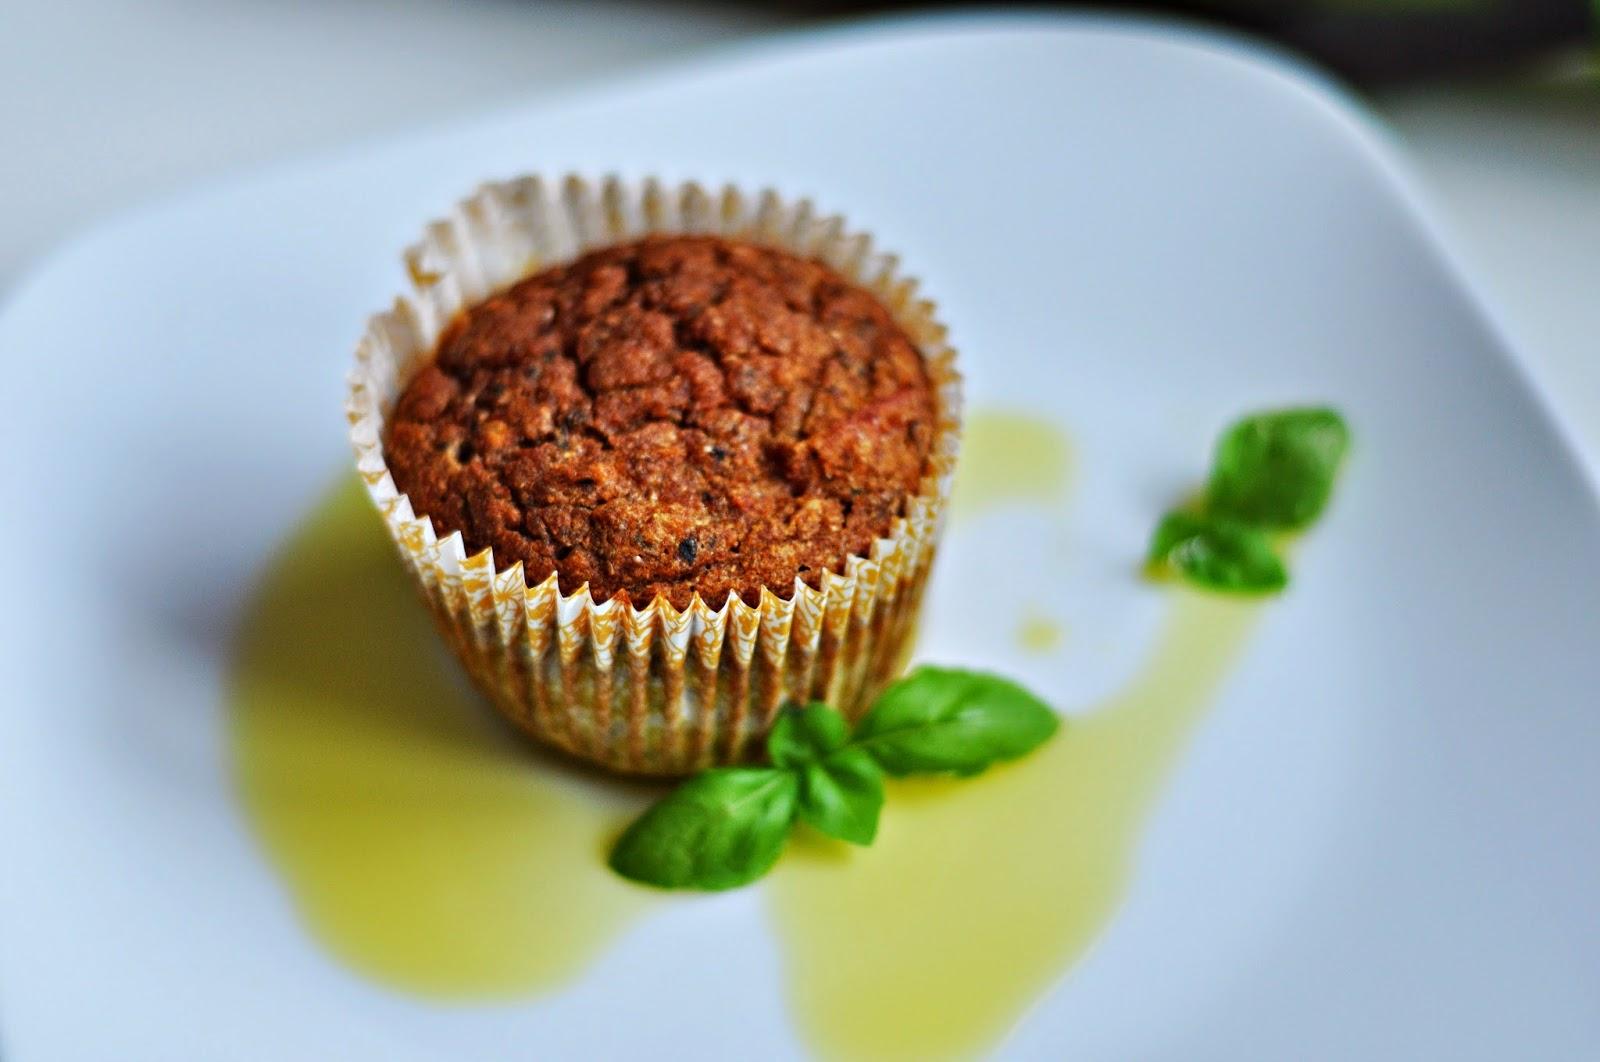 Wytrawne muffiny bolognese